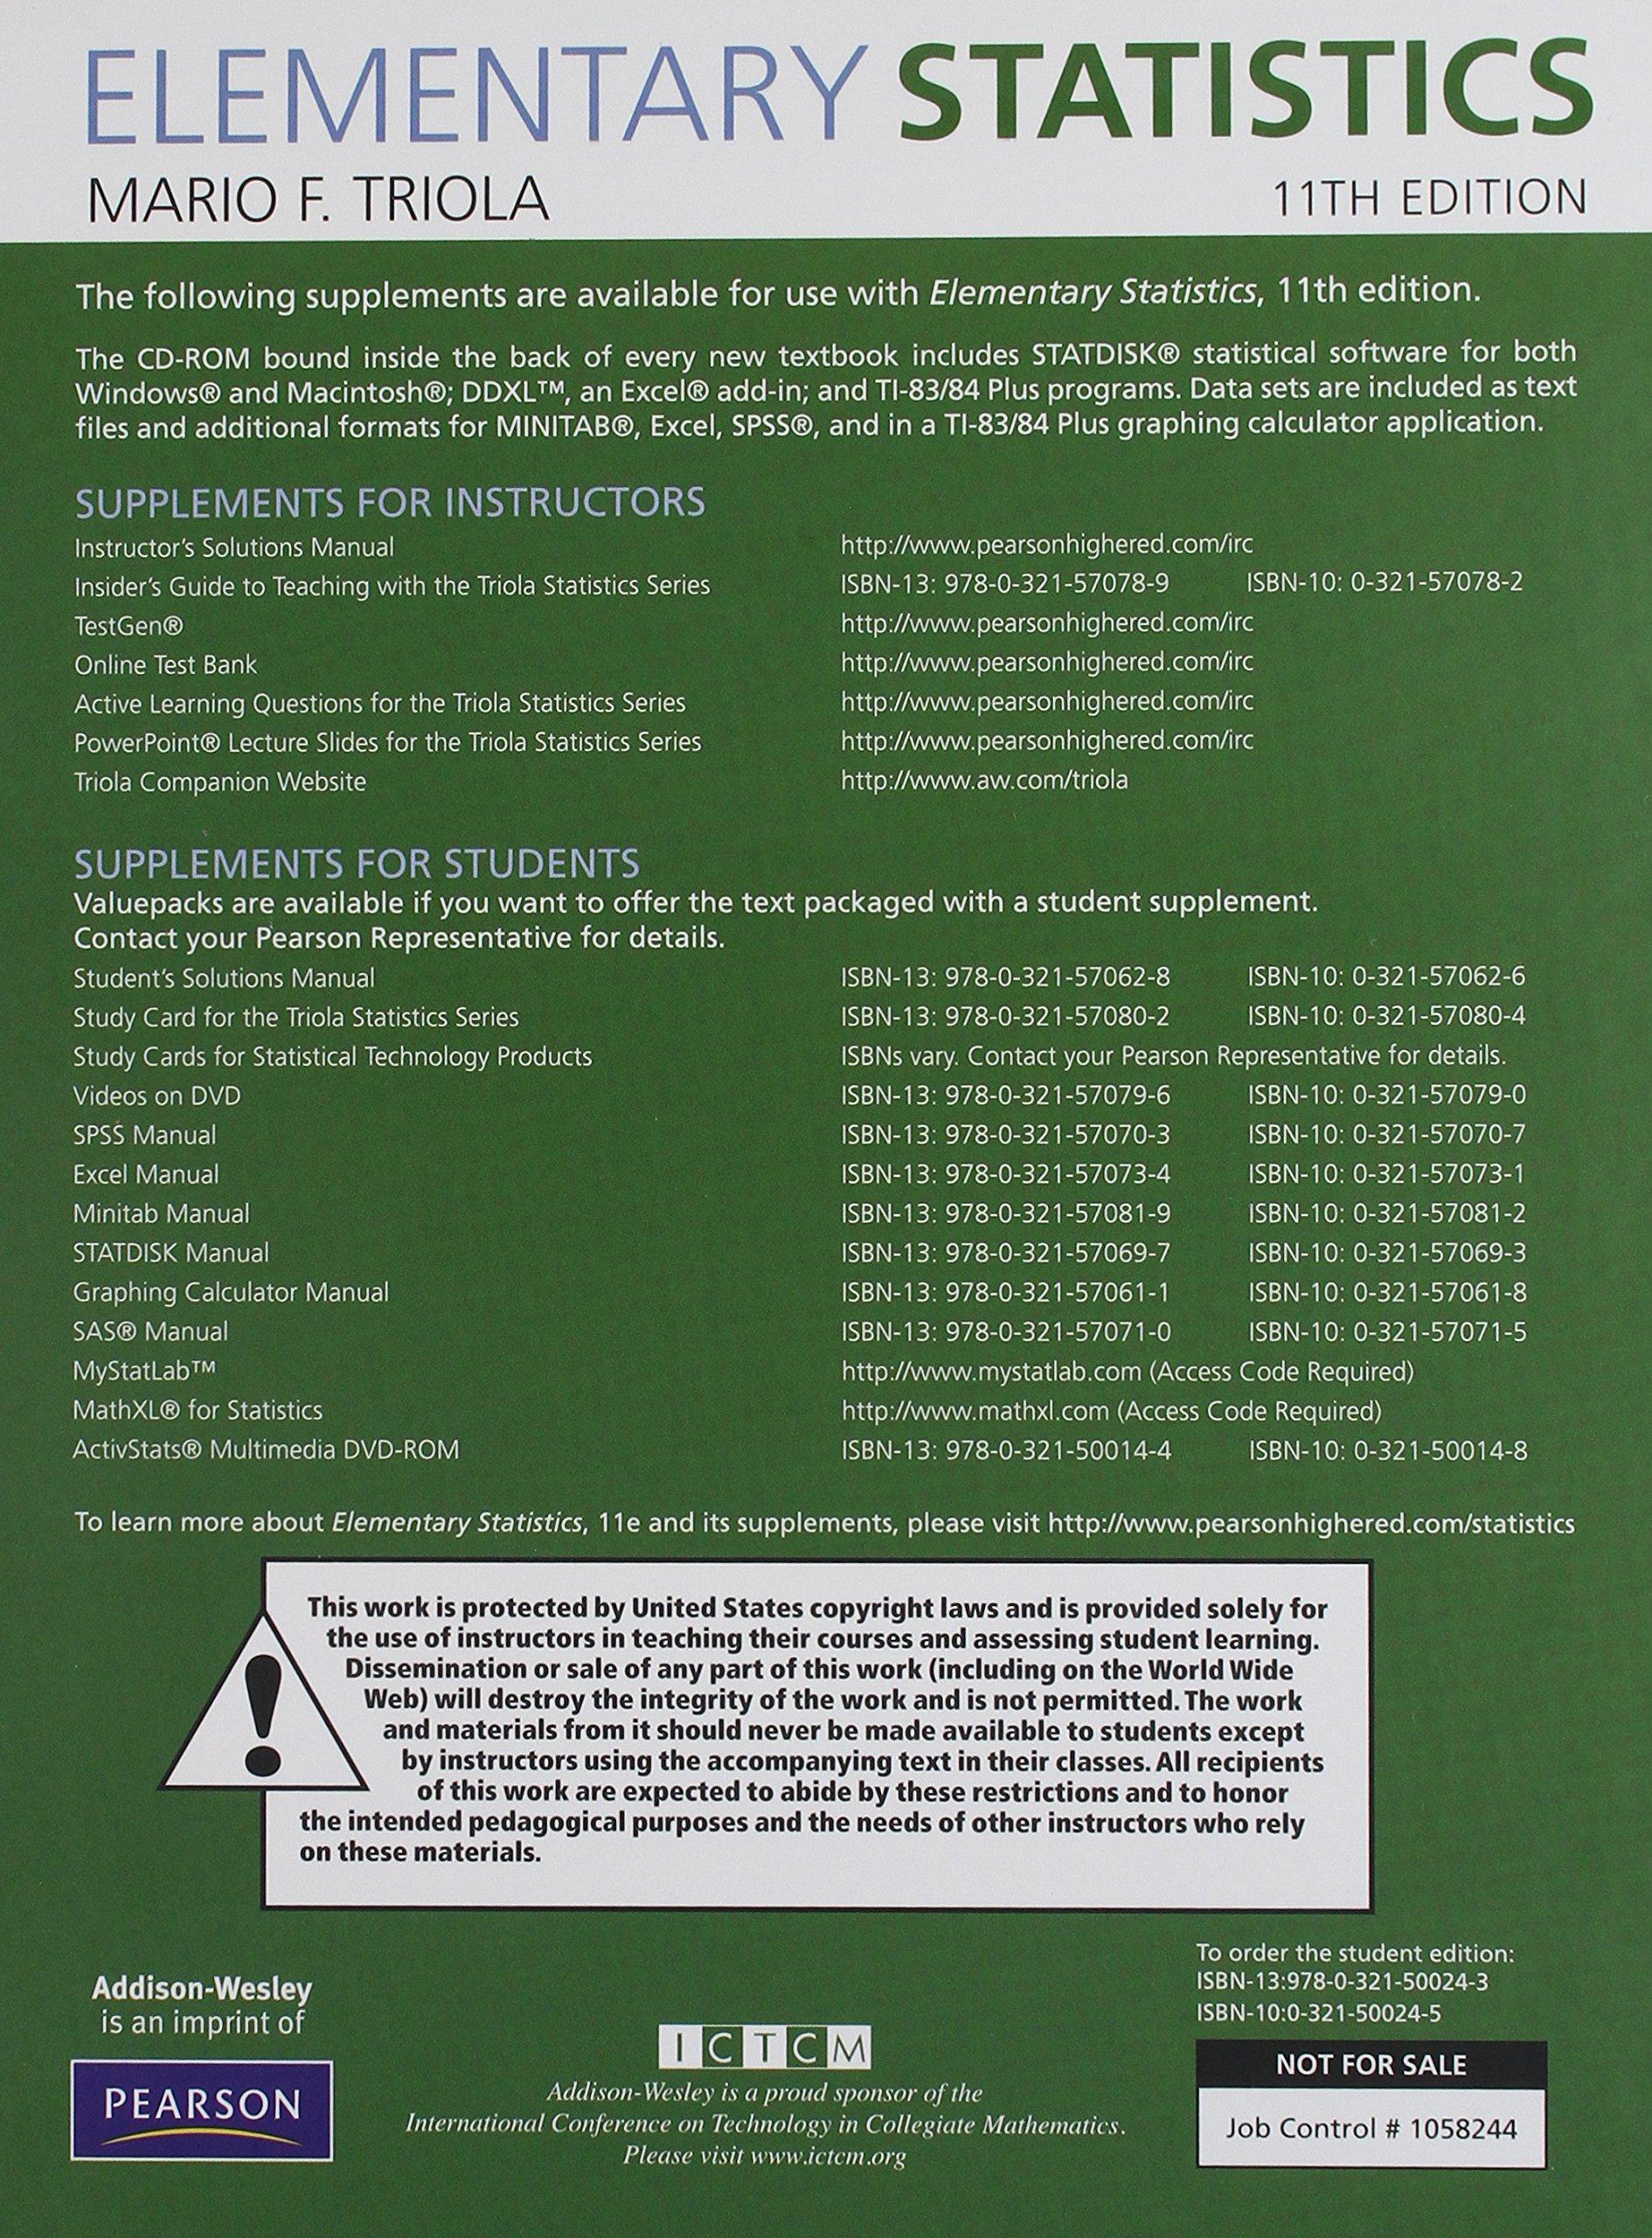 Elementary Statistics Annotated Instructor's Edition: Mario F. Triola:  9780321570826: Amazon.com: Books